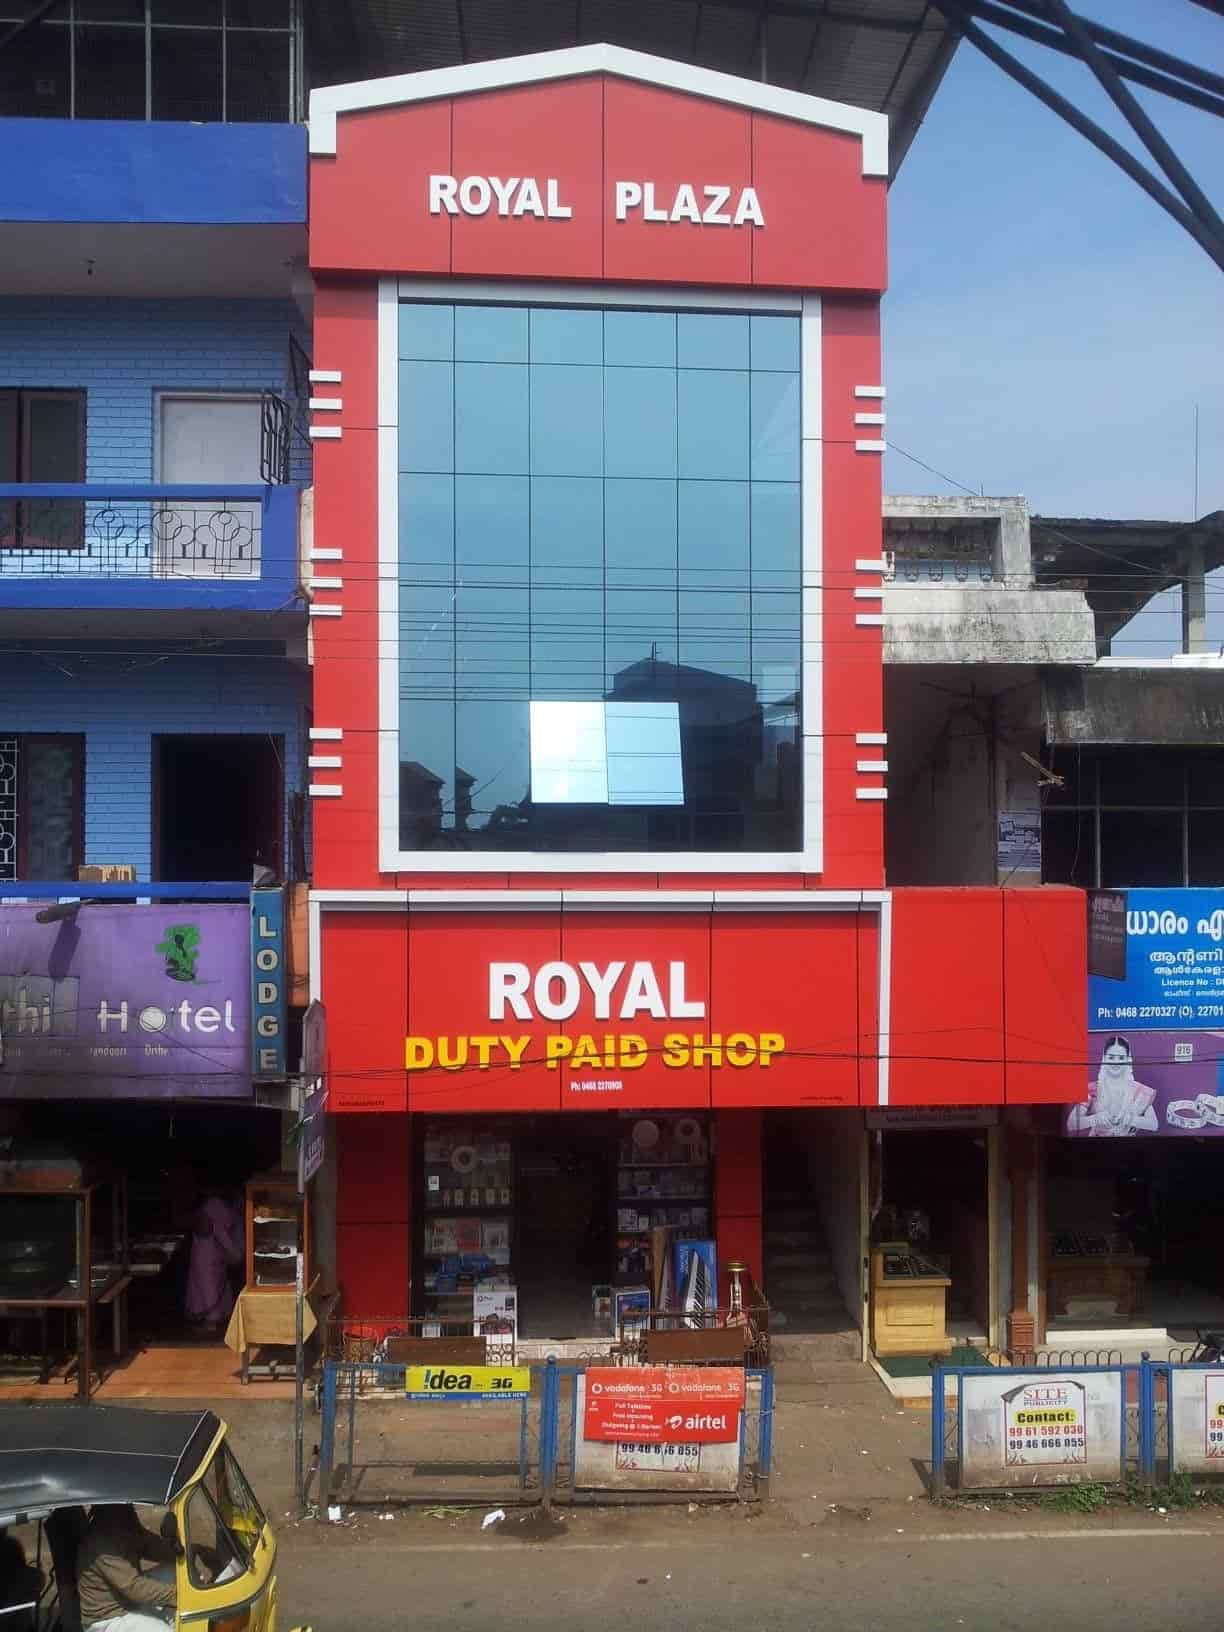 ROYAL DUTY PAID SHOP, Pathanamthitta HO - Mobile Phone